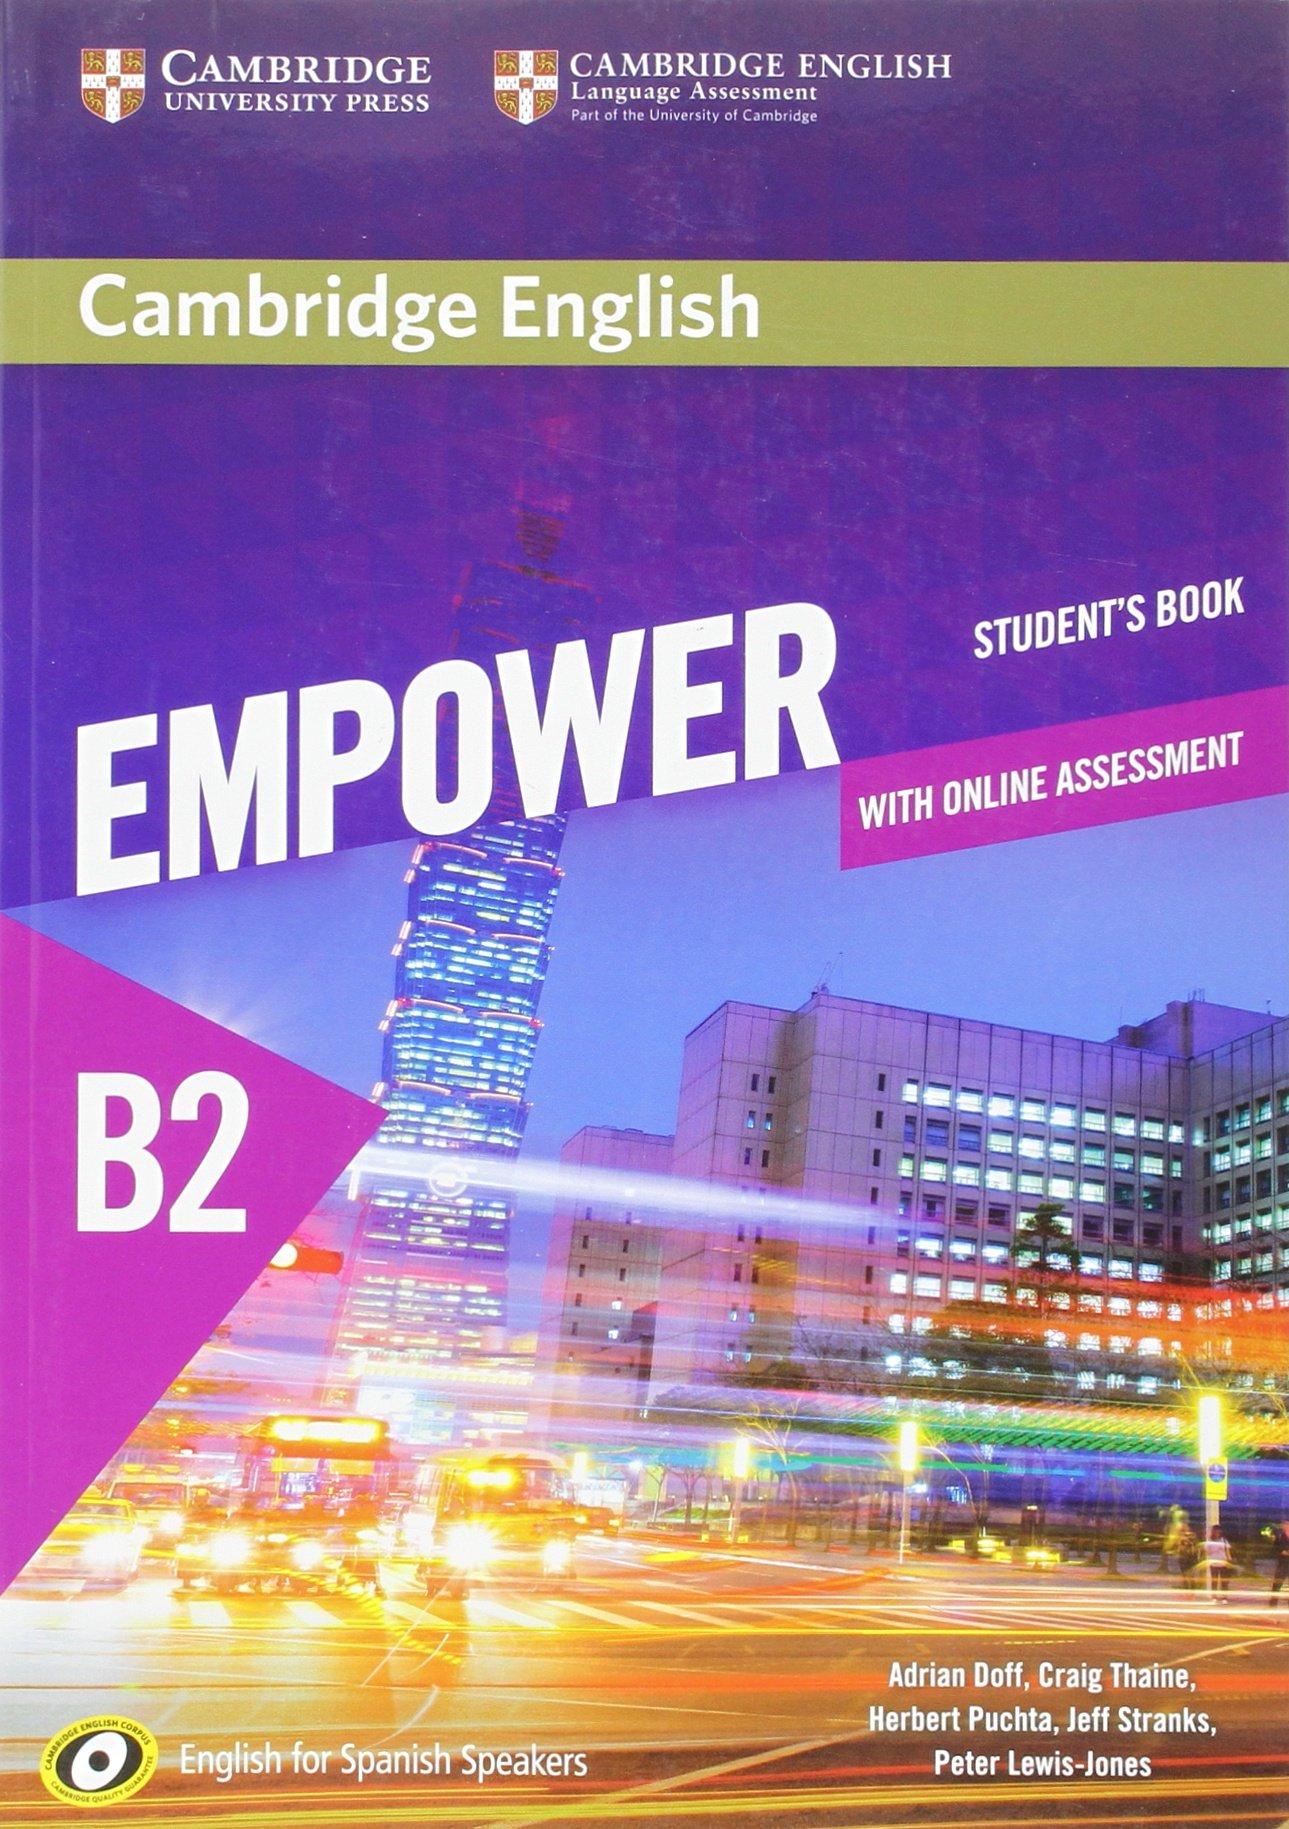 Cambridge English Empower for Spanish Speakers B2 Student's Book with Online Assessment and Practice (Inglés) Tapa blanda – 10 jun 2016 Adrian Doff Craig Thaine Herbert Puchta Jeff Stranks